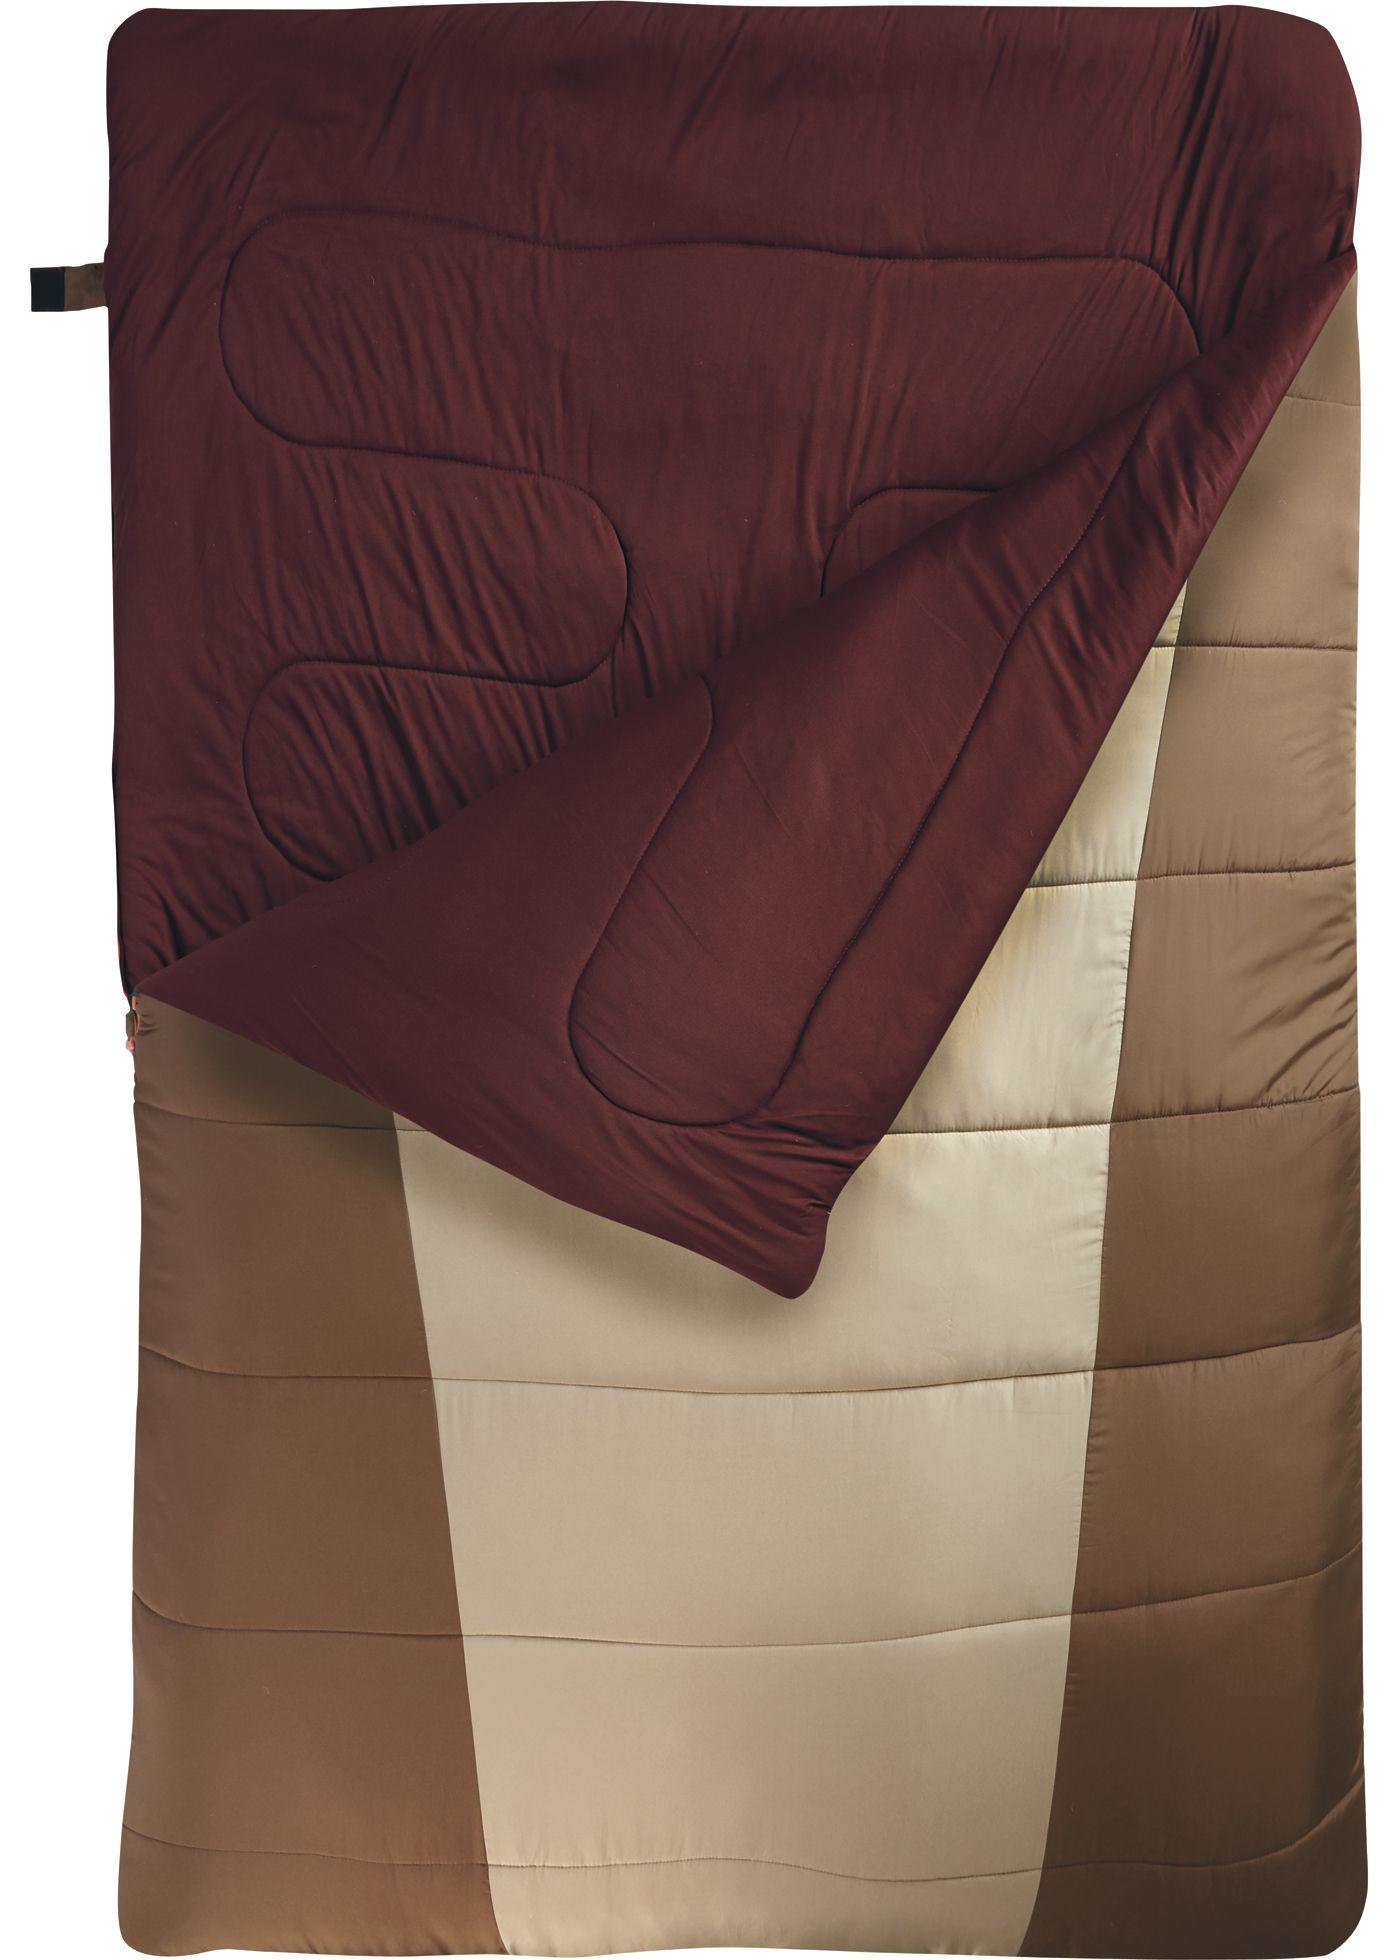 Field & Stream Cabin Comfort 35°F Sleeping Bag